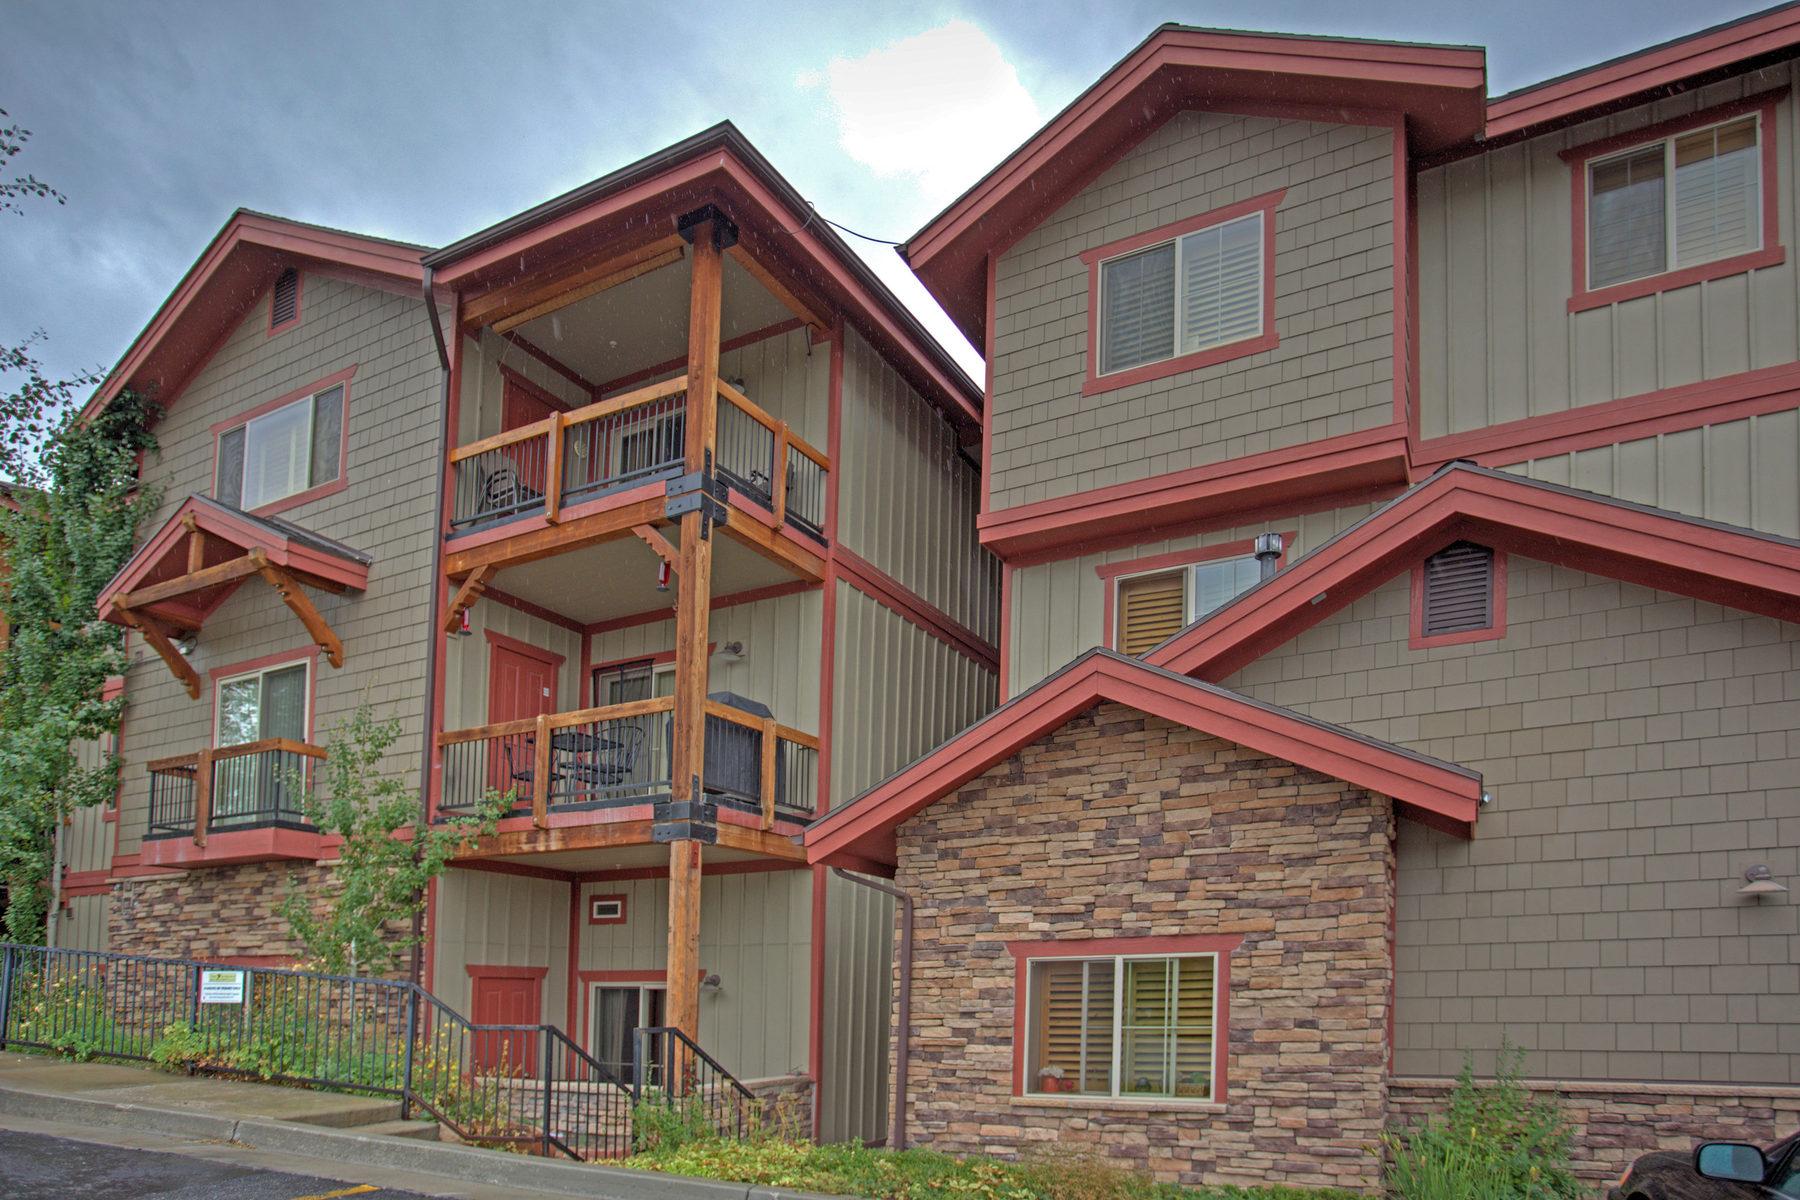 Condominium for Sale at Beautiful Corner Unit with Nice Views 5501 Lillehammer Ln #4309 Park City, Utah 84098 United States